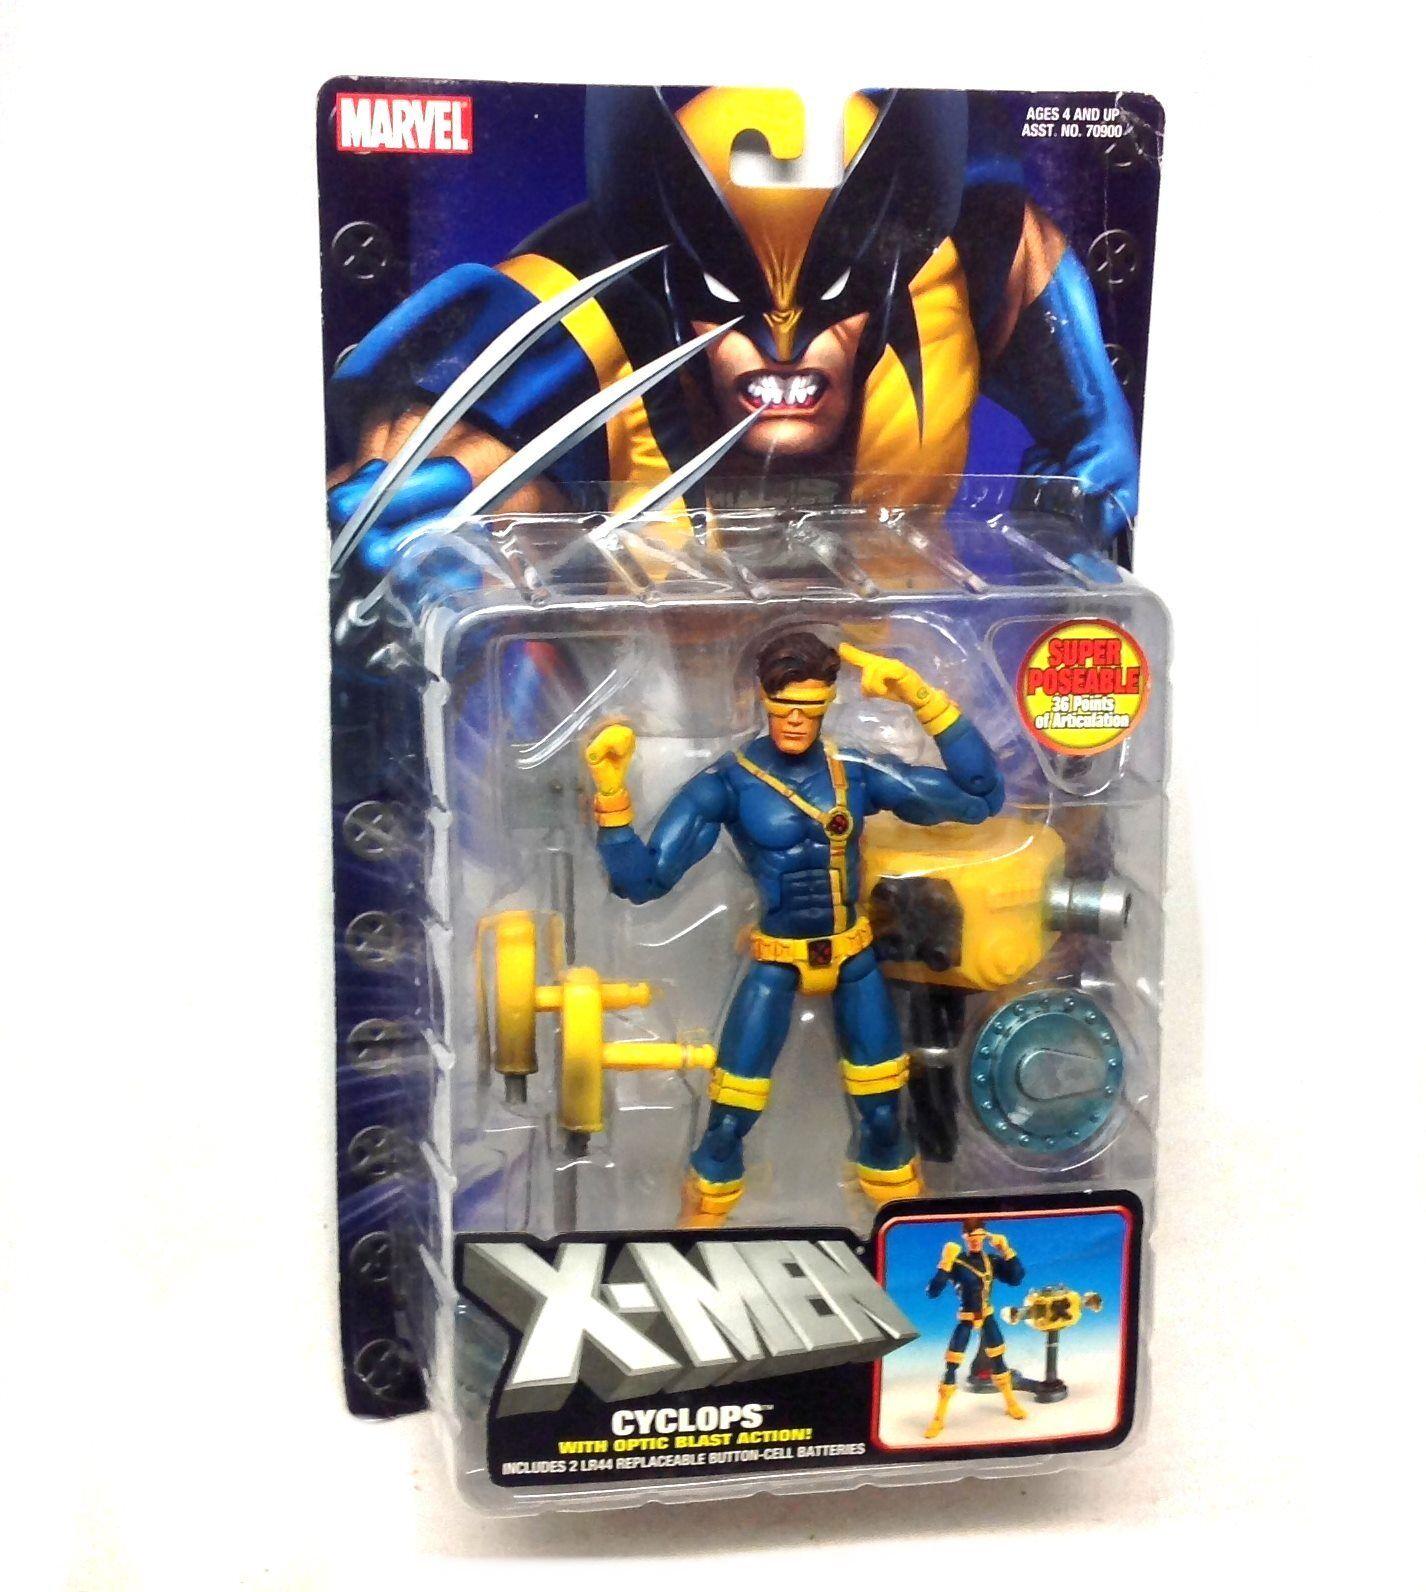 Marvel  Legends  X Men Classic Jim Lee style CYCLOPS 6  figure RARE, box Damaged